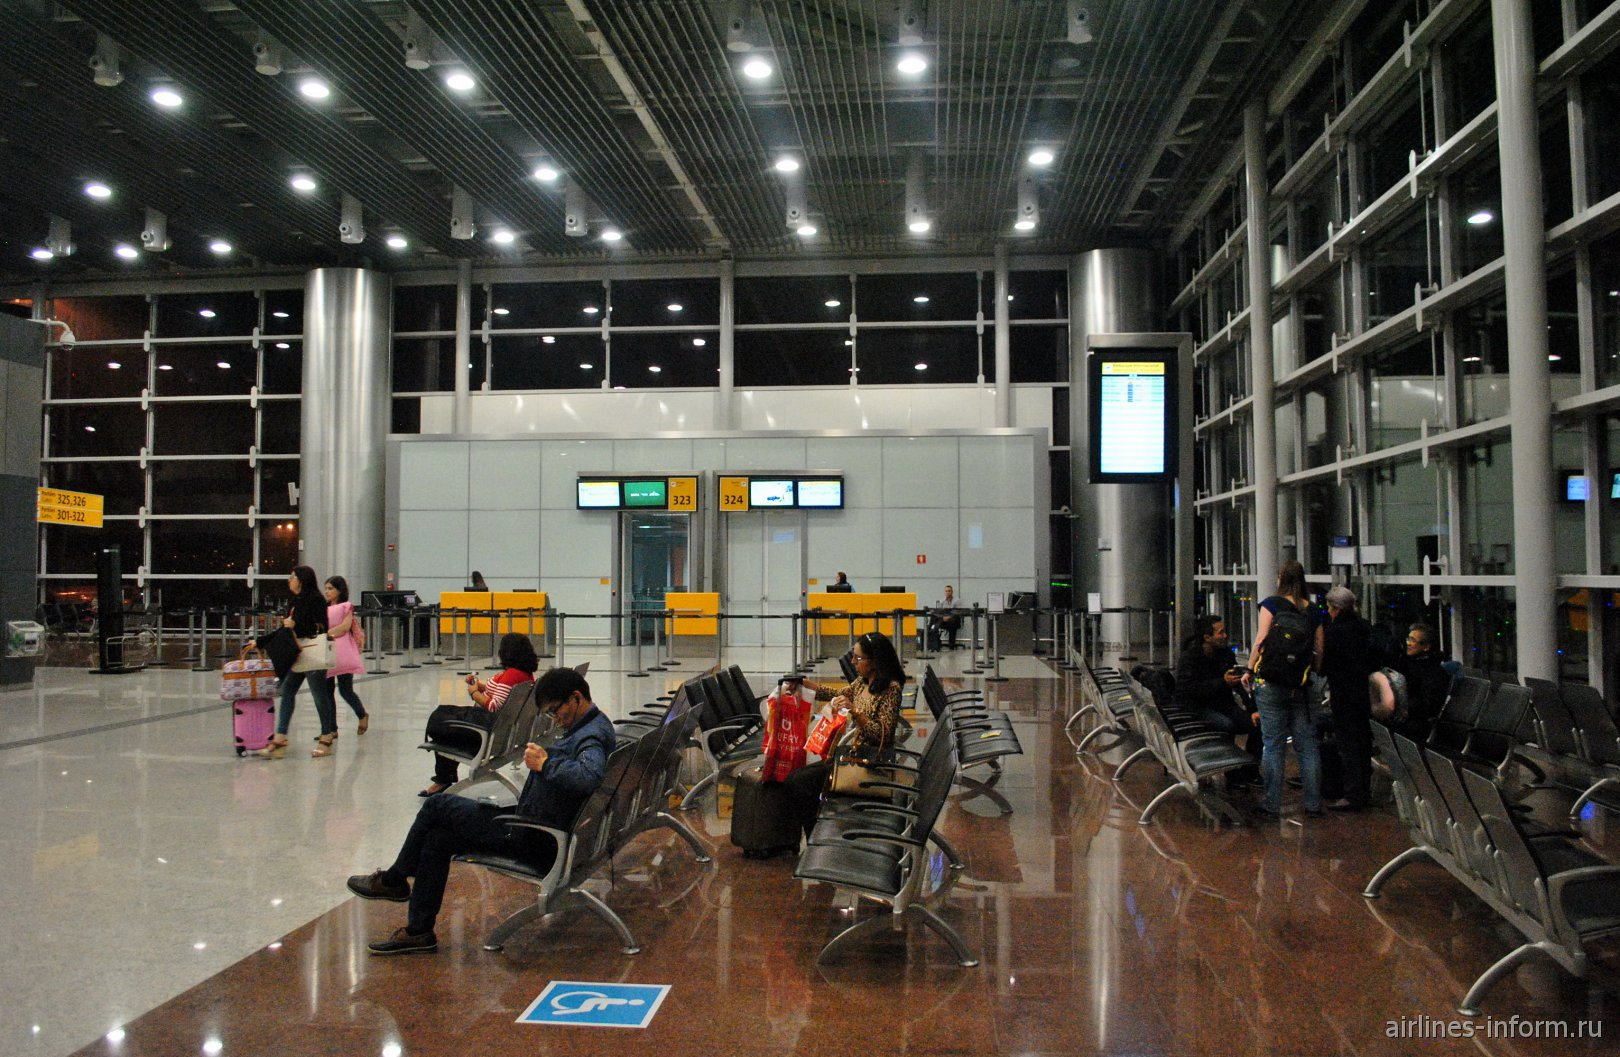 Гейты 323-324 в терминале Т3 аэропорта Сан-Паулу Гуарулхос